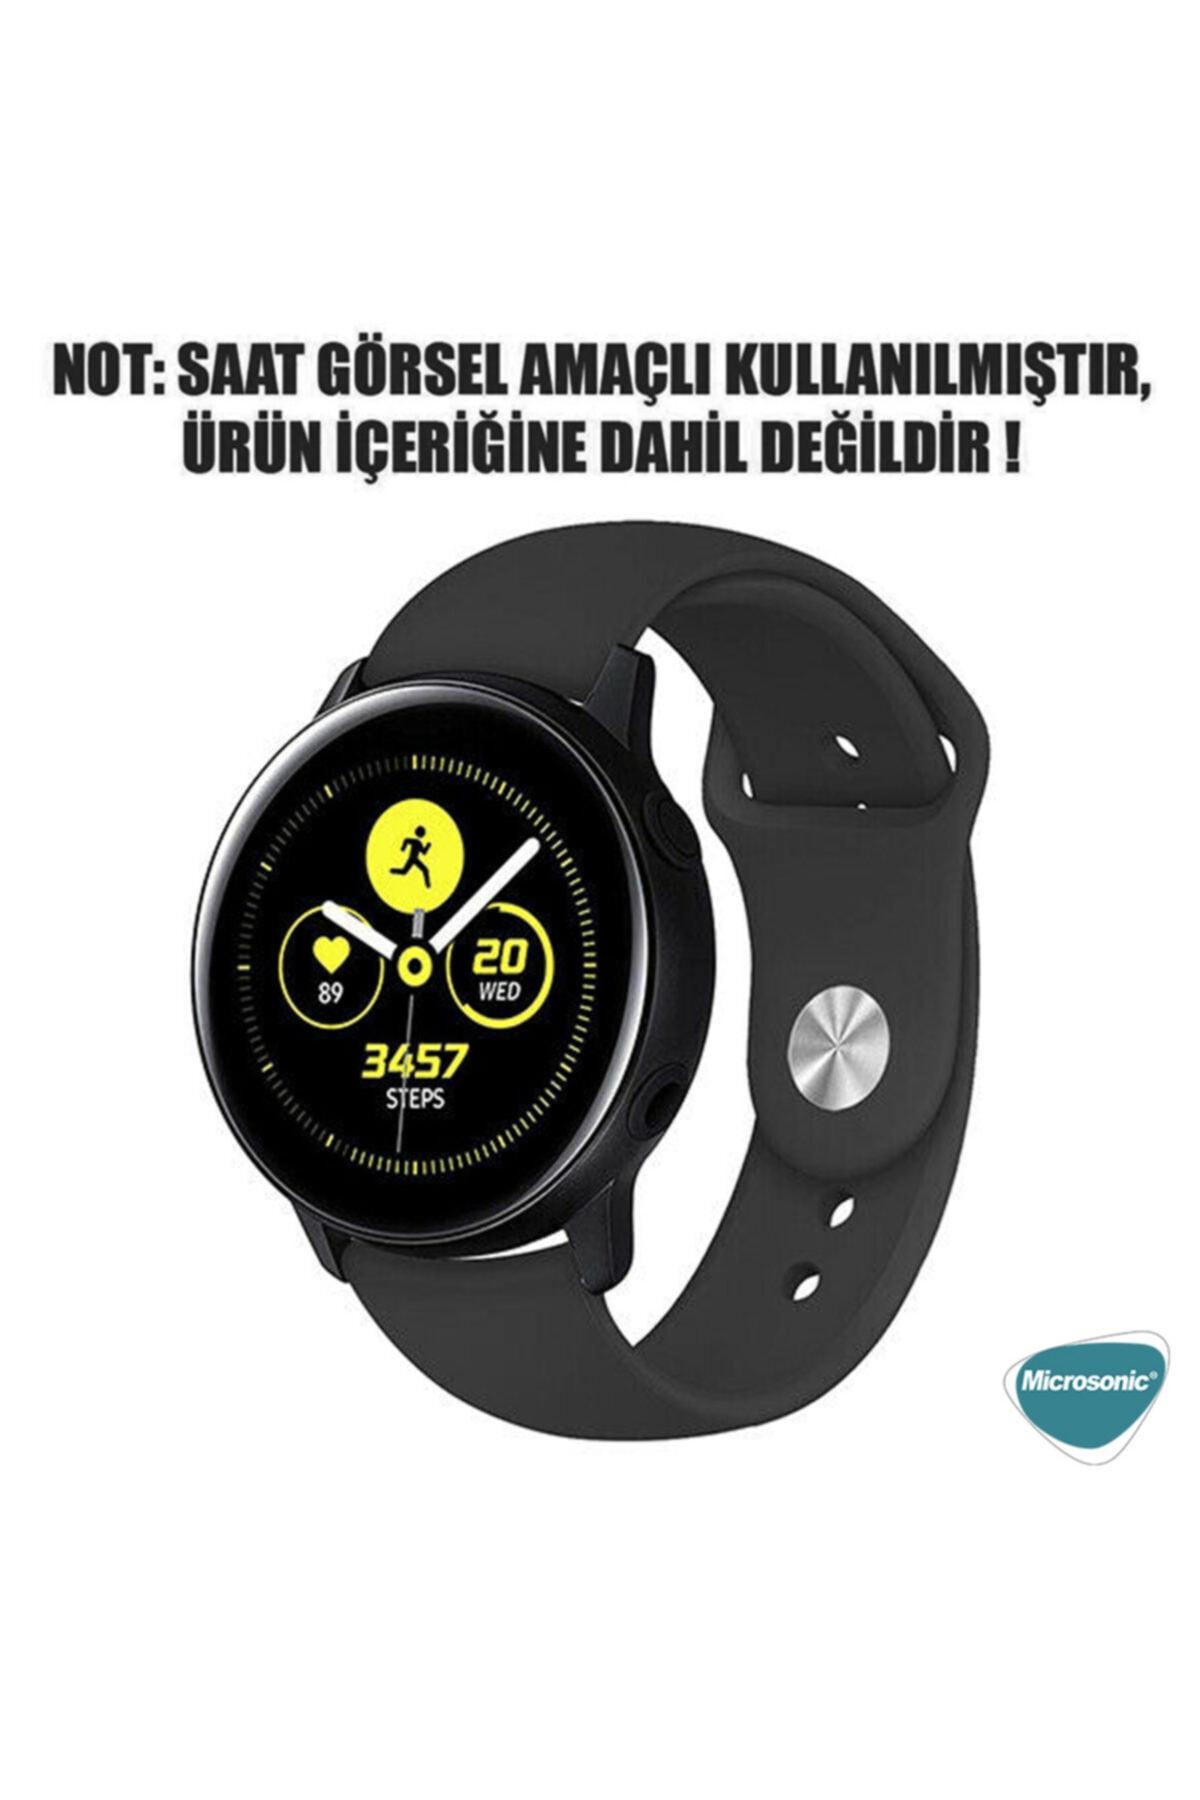 Microsonic Huawei Watch Gt2 Pro Uyumlu Silicone Sport Band Sarı 2